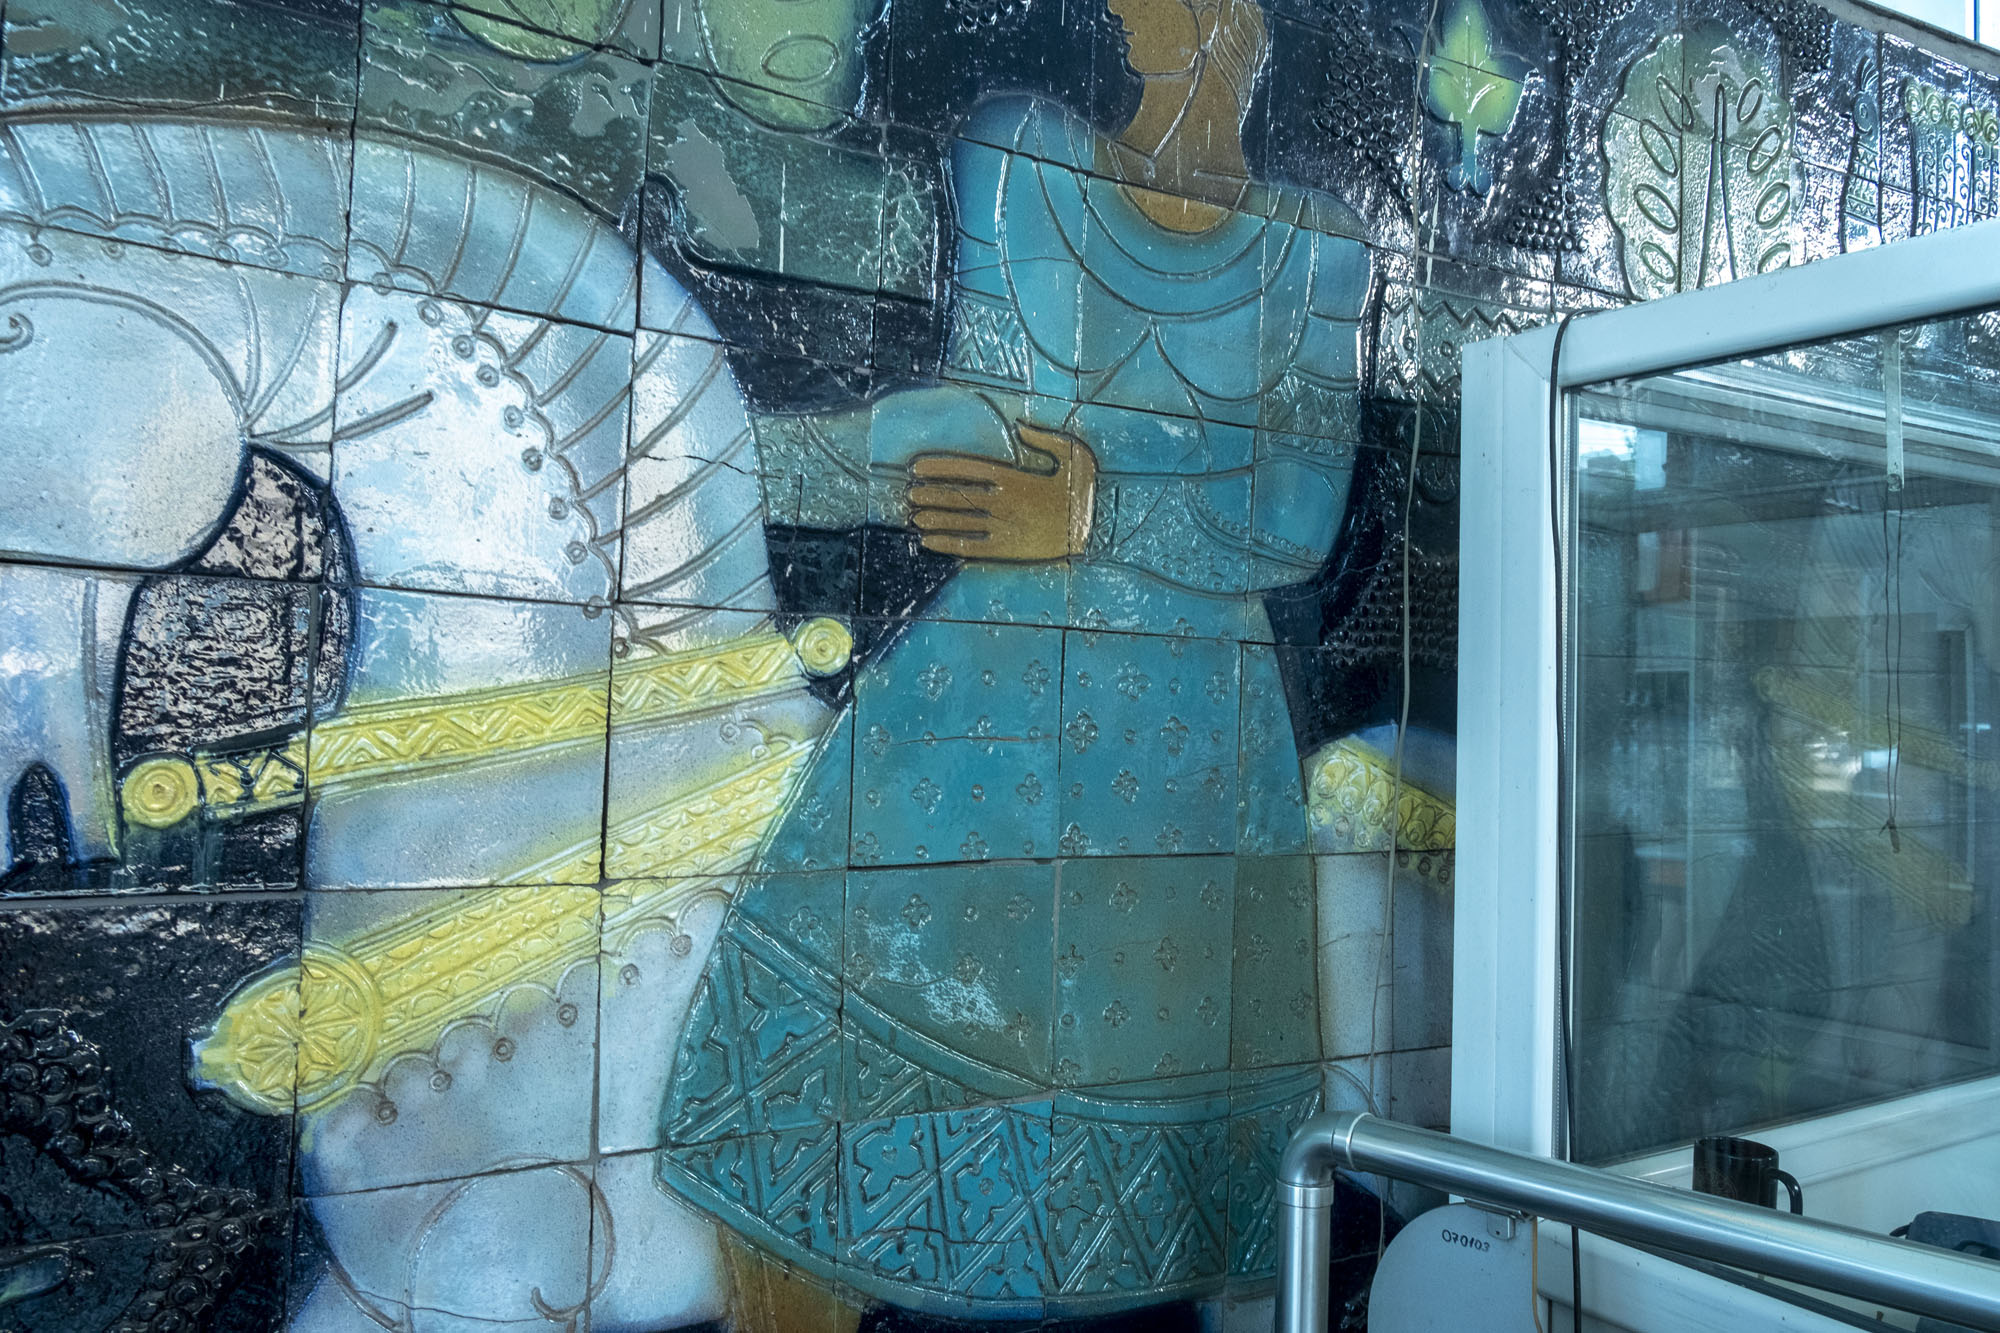 tblisi metro mural.jpg